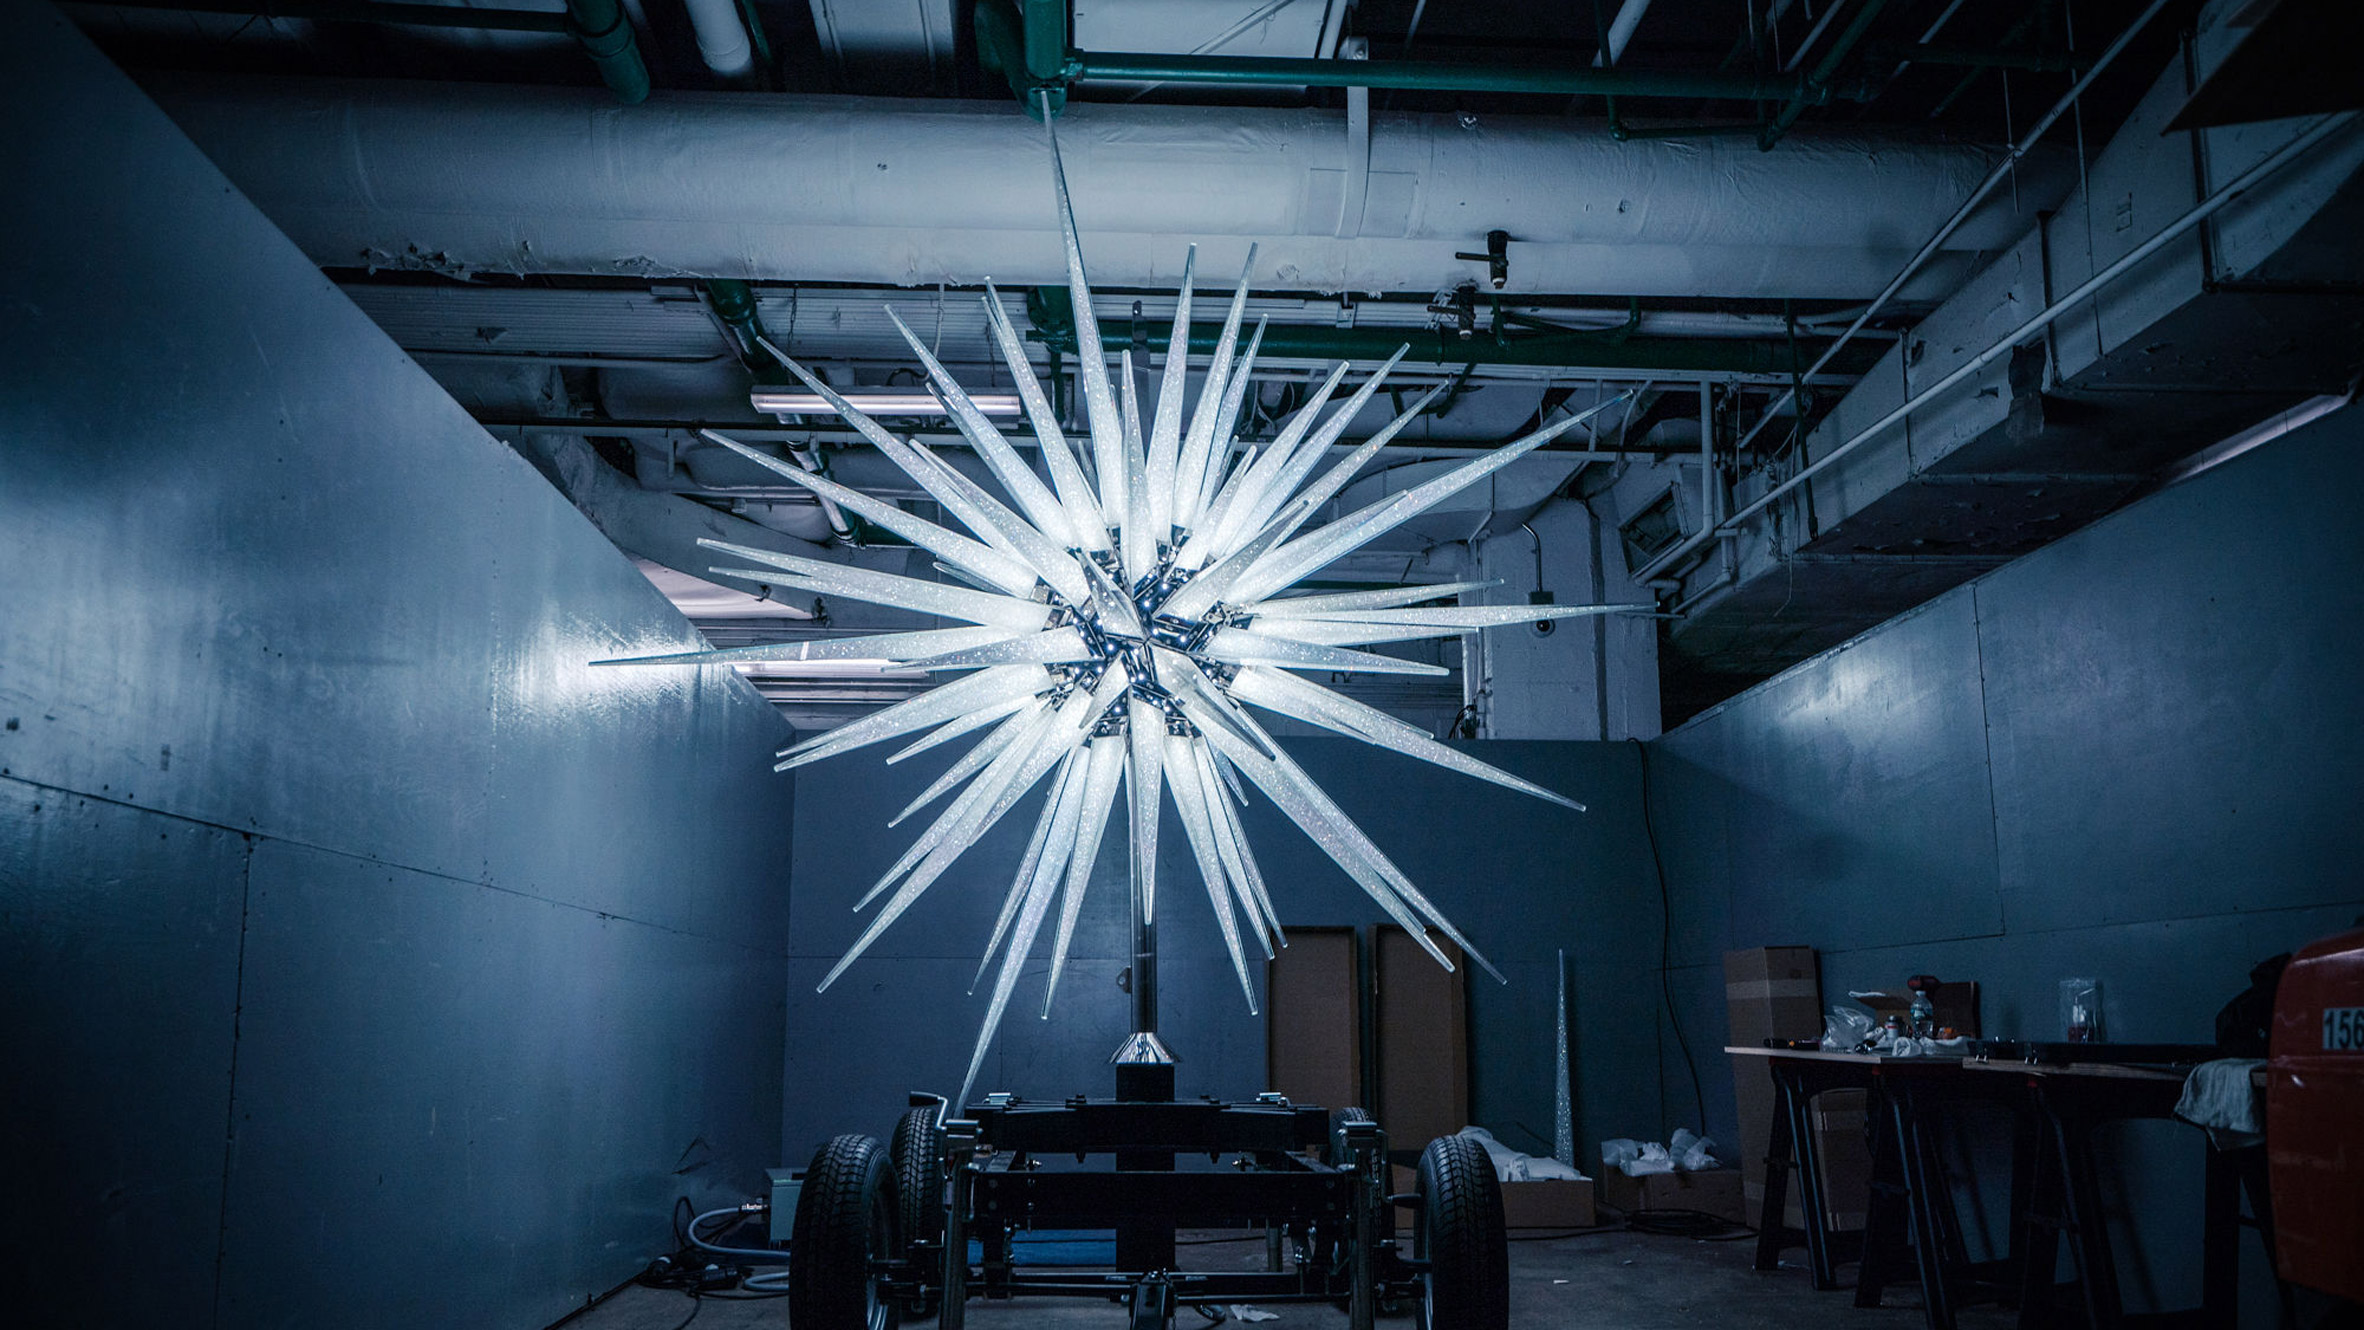 Daniel Libeskind's Swarovski Star for Rockefeller Center Christmas tree